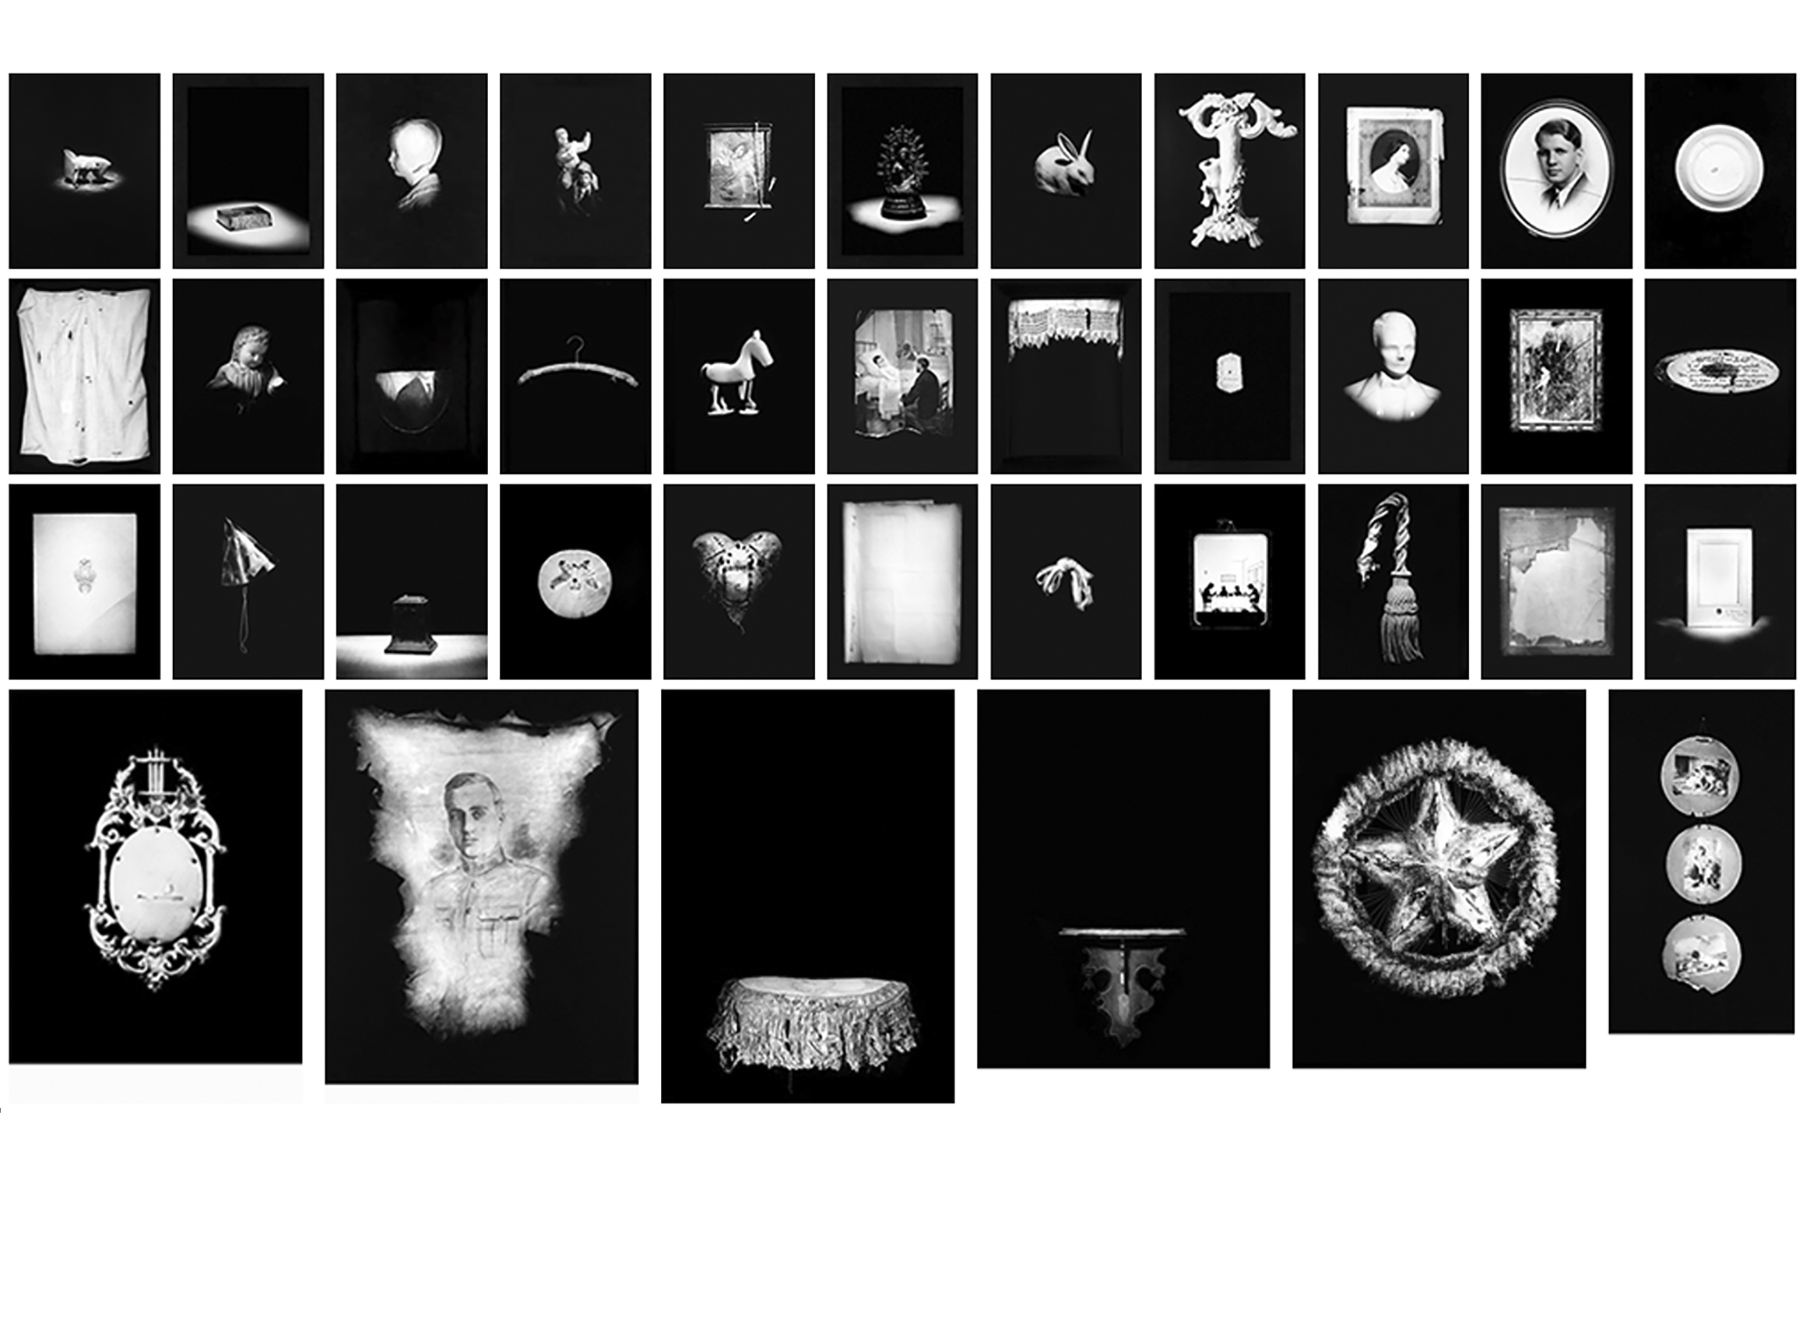 Series of 42, 1995-1997